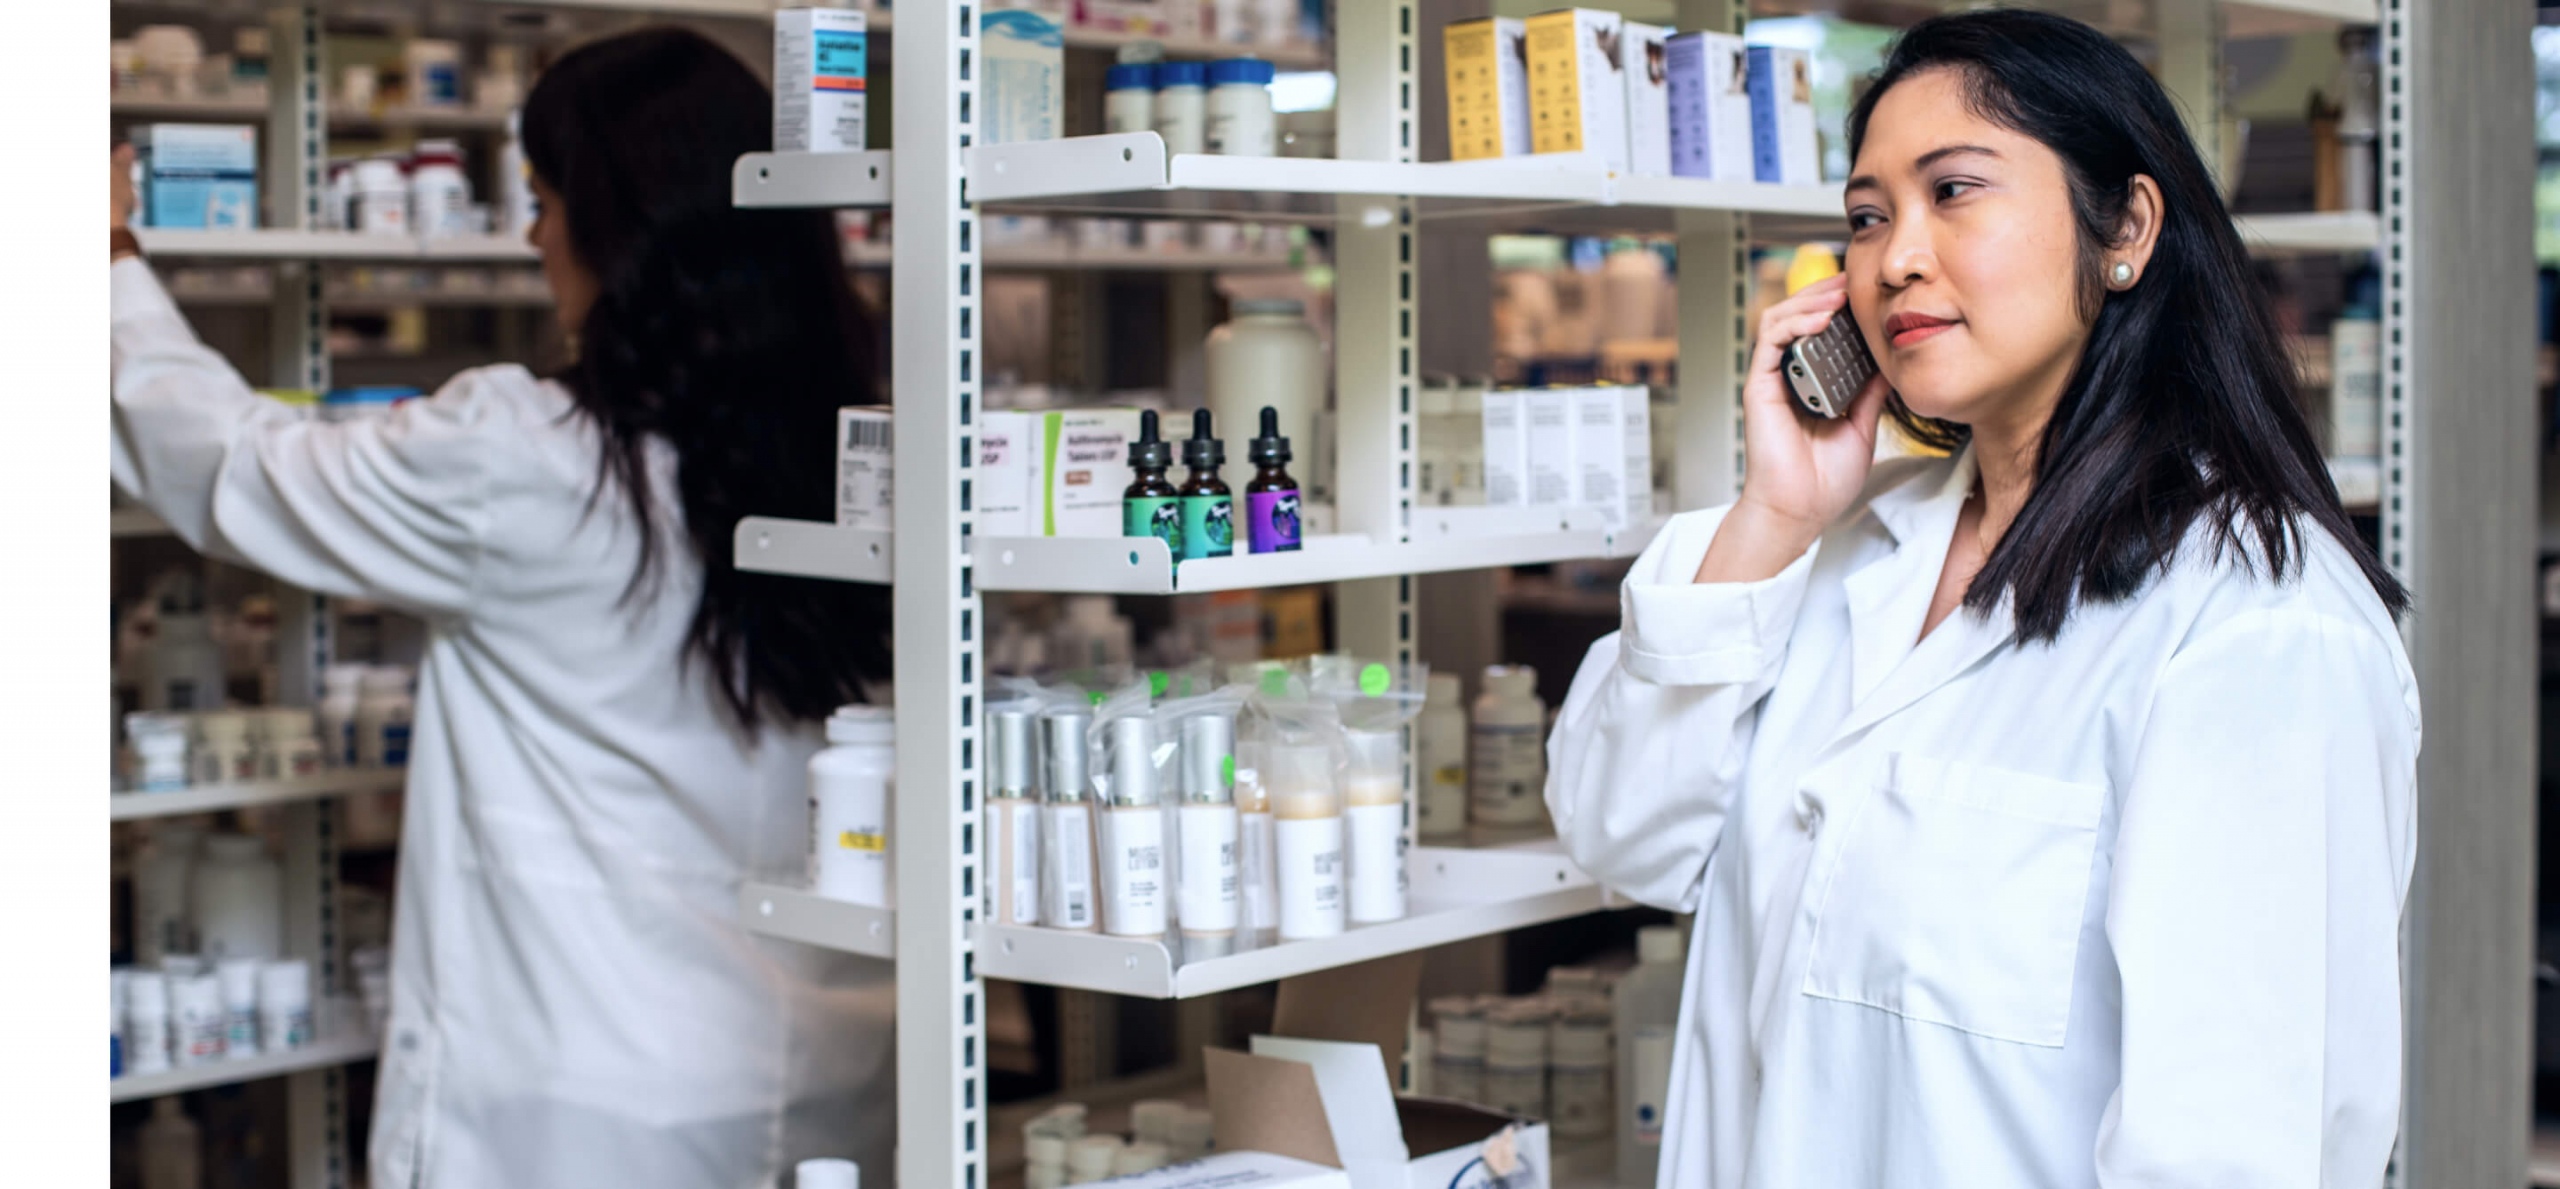 pharmacist on phone